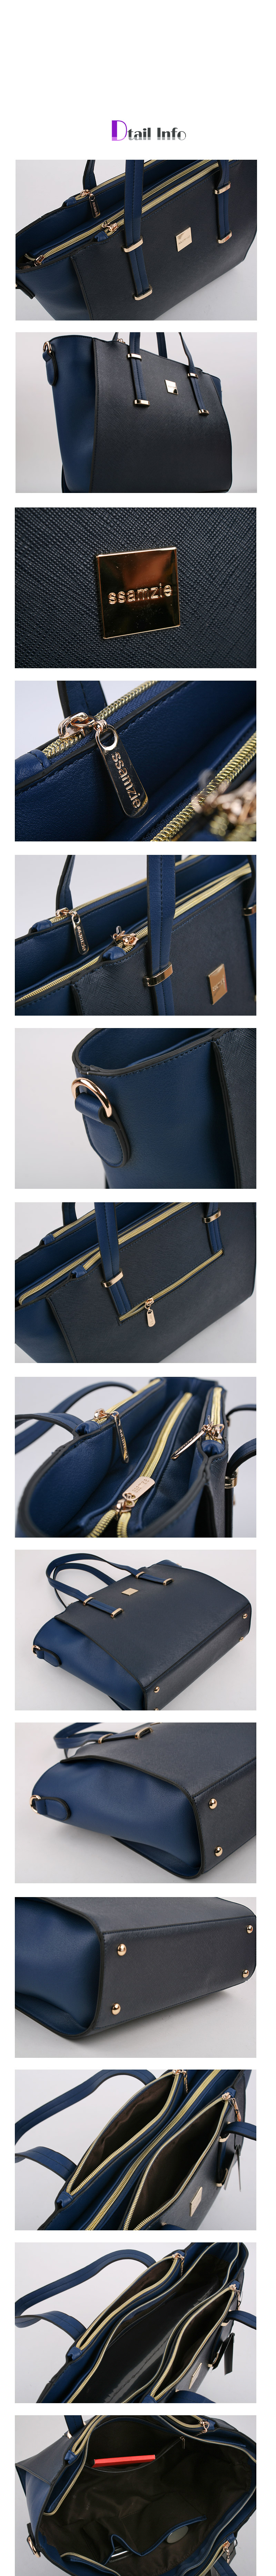 ssamzie handbag no.SSAMZIE-602view-1